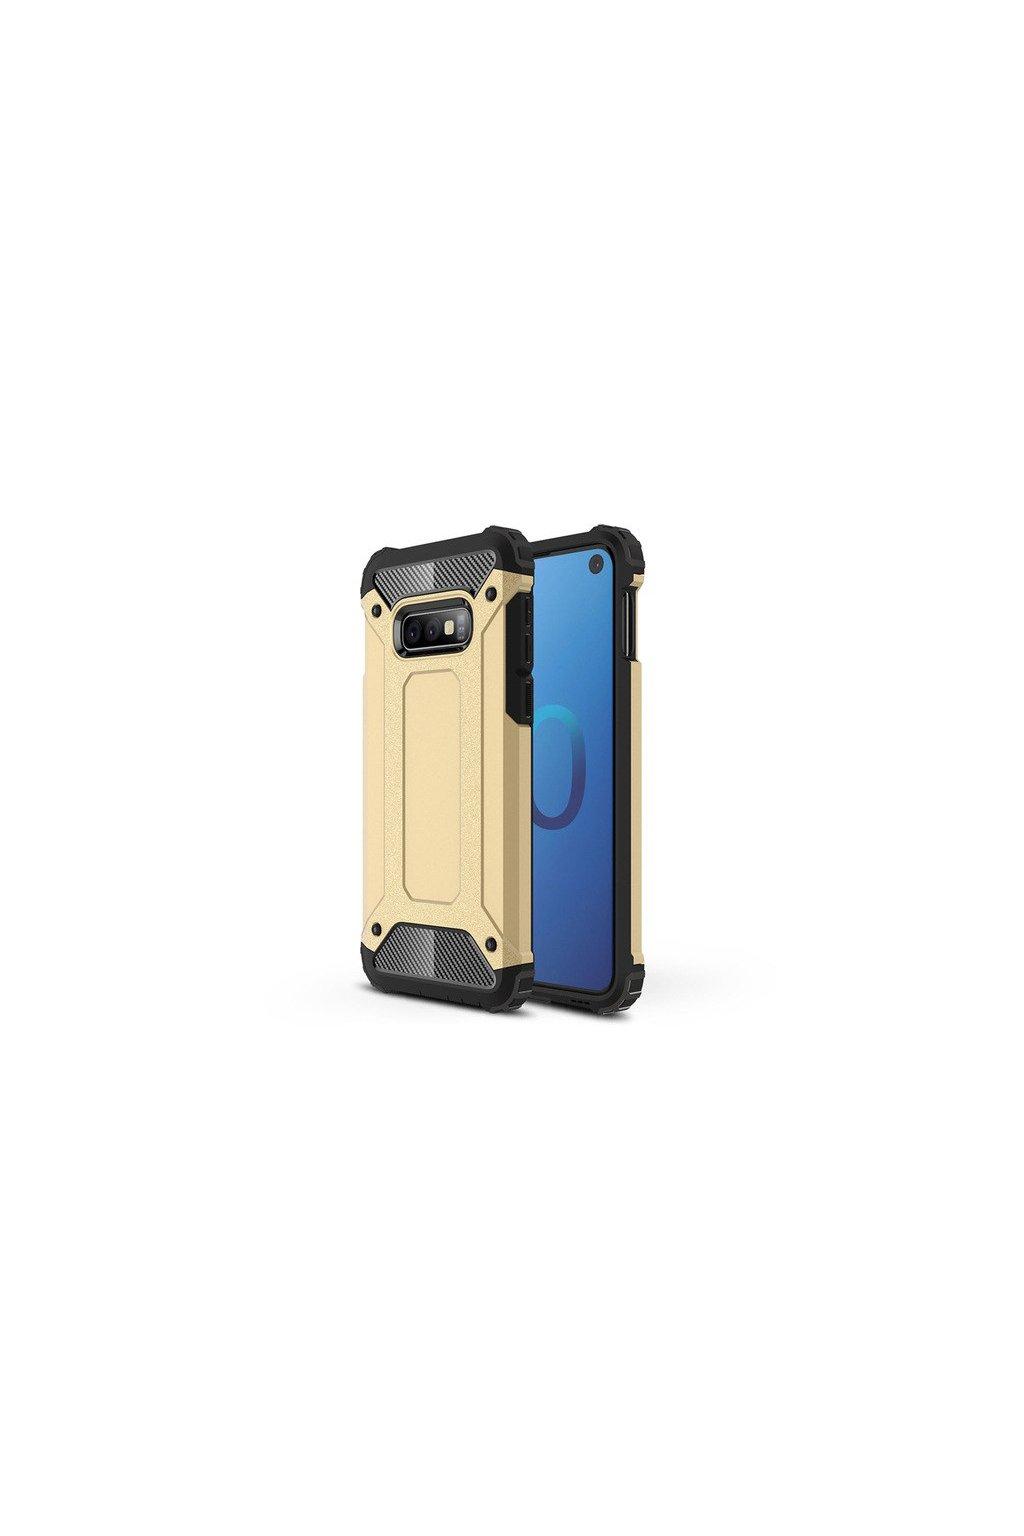 eng pl Hybrid Armor Case Tough Rugged Cover for Samsung Galaxy S10 Lite golden 46578 1